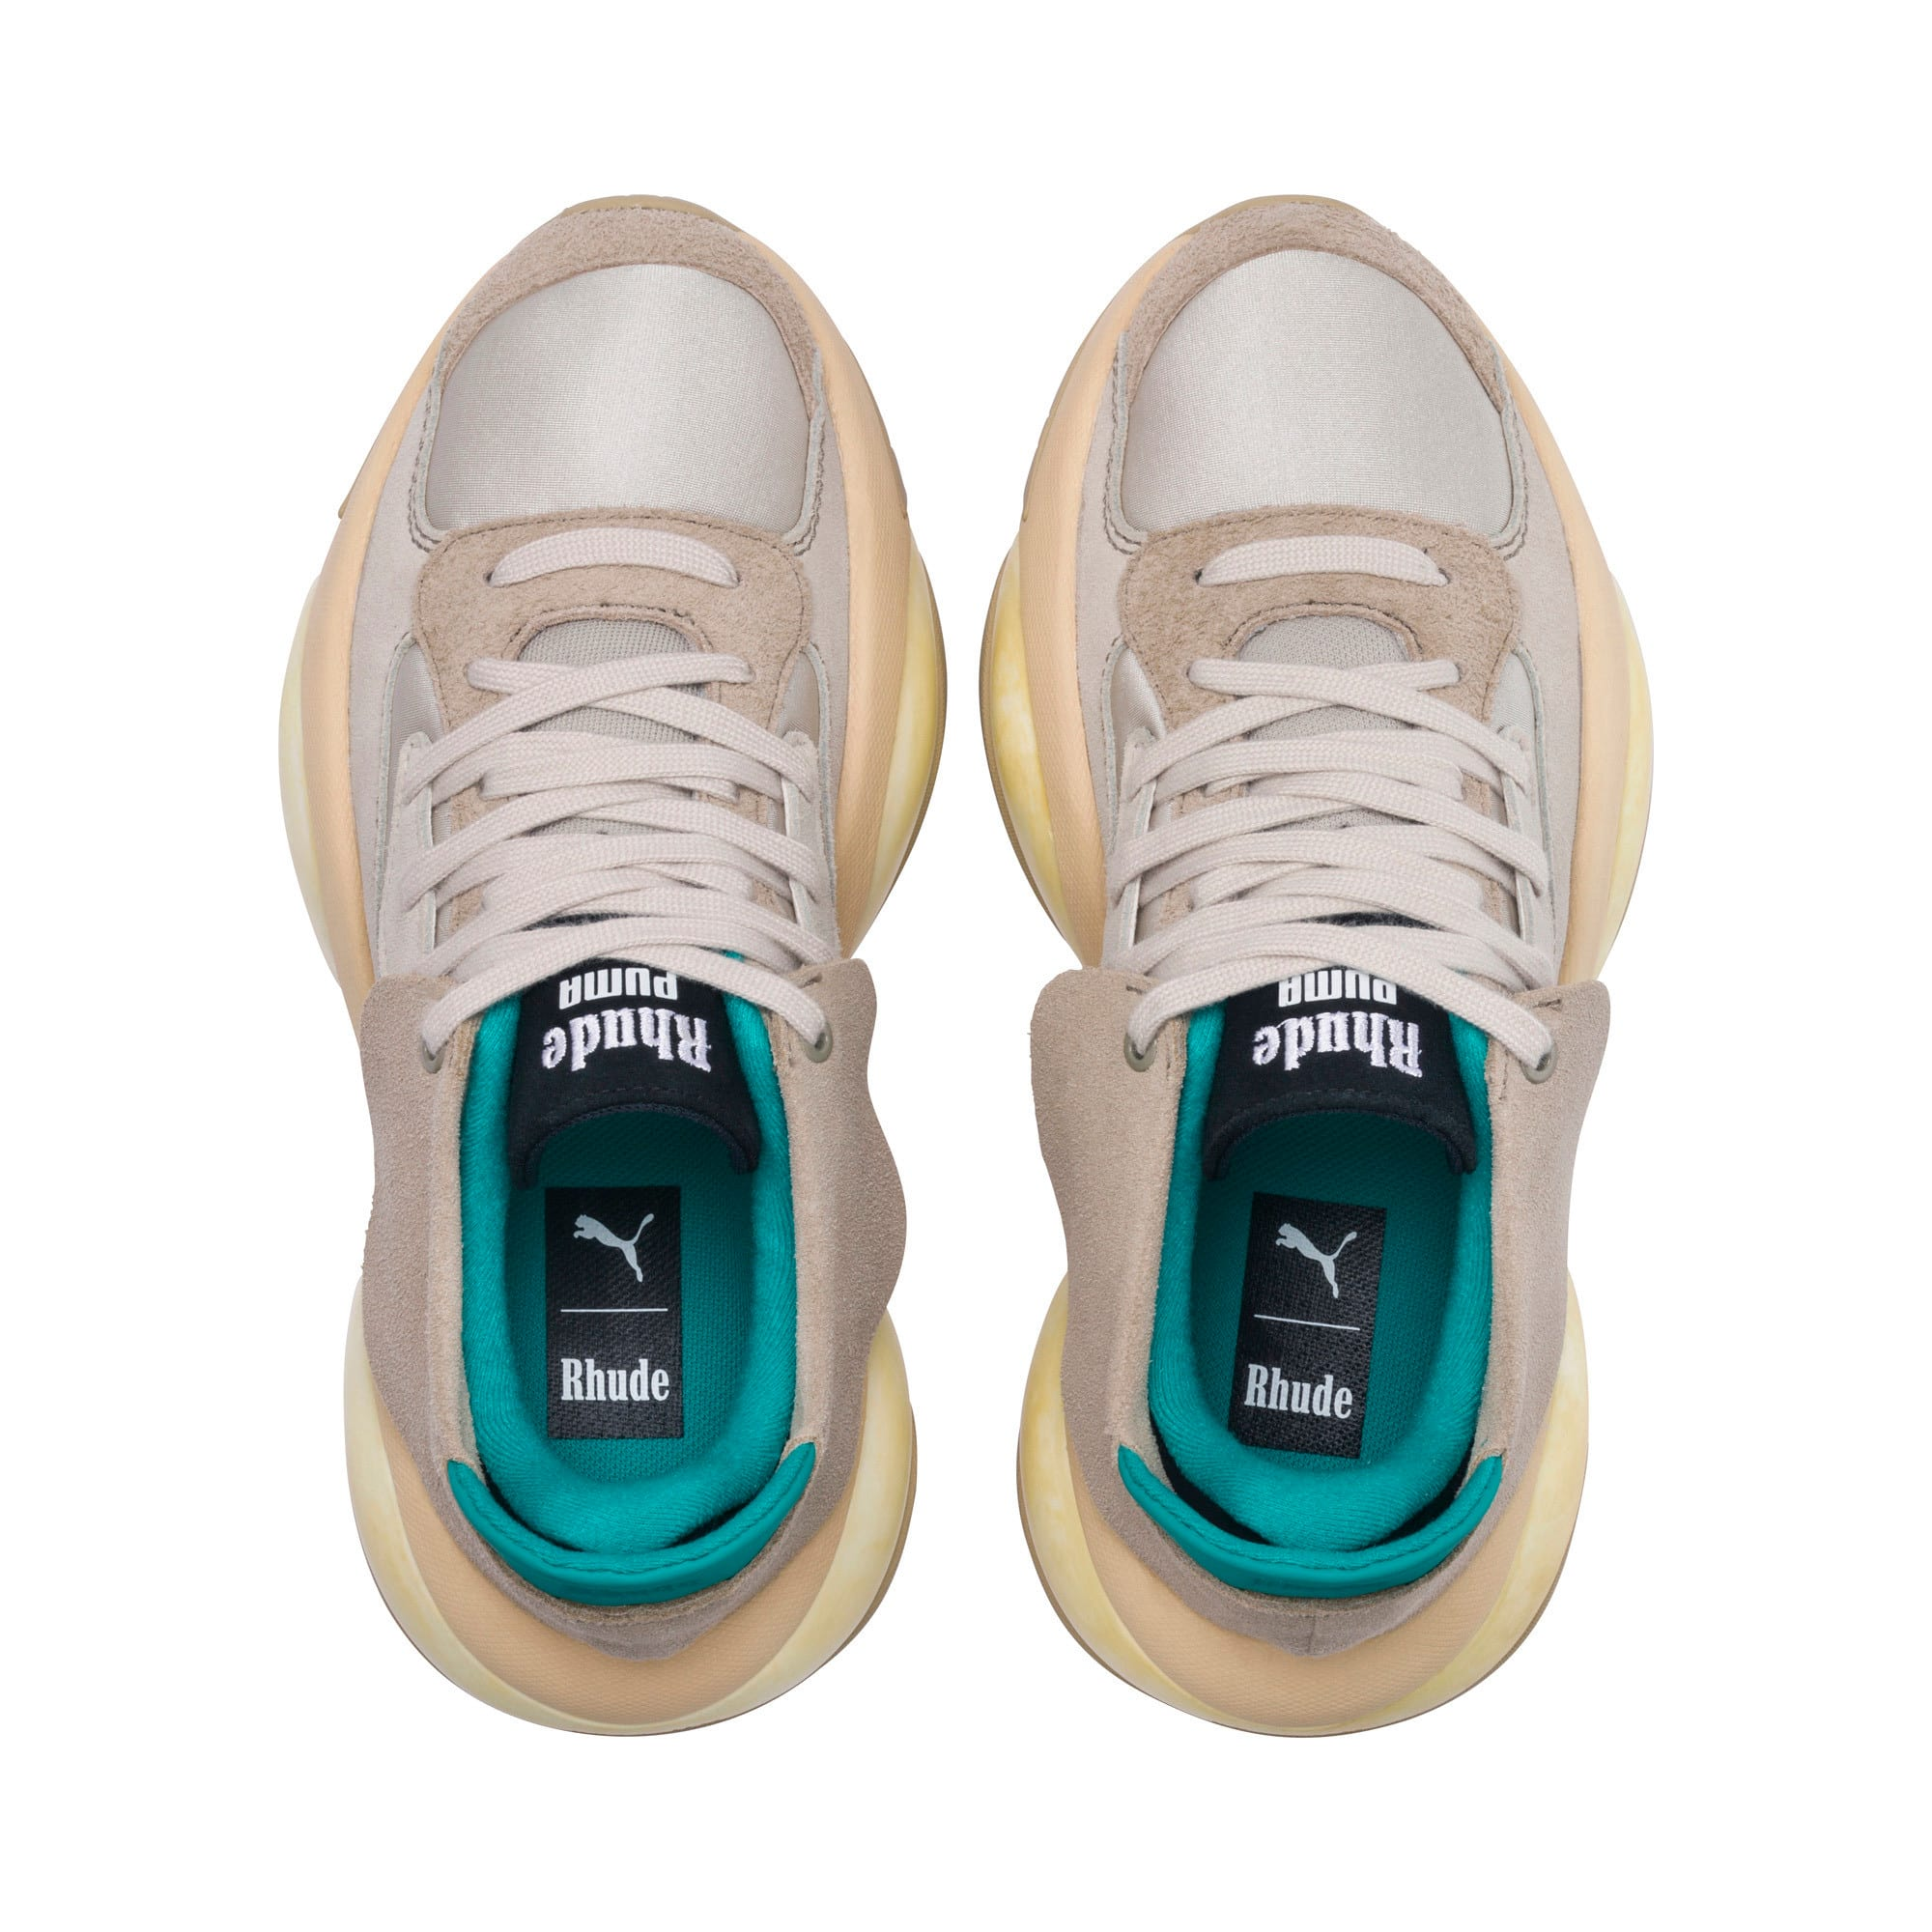 Thumbnail 6 of PUMA x RHUDE Alteration Sneakers, Chinchilla-Whisper White, medium